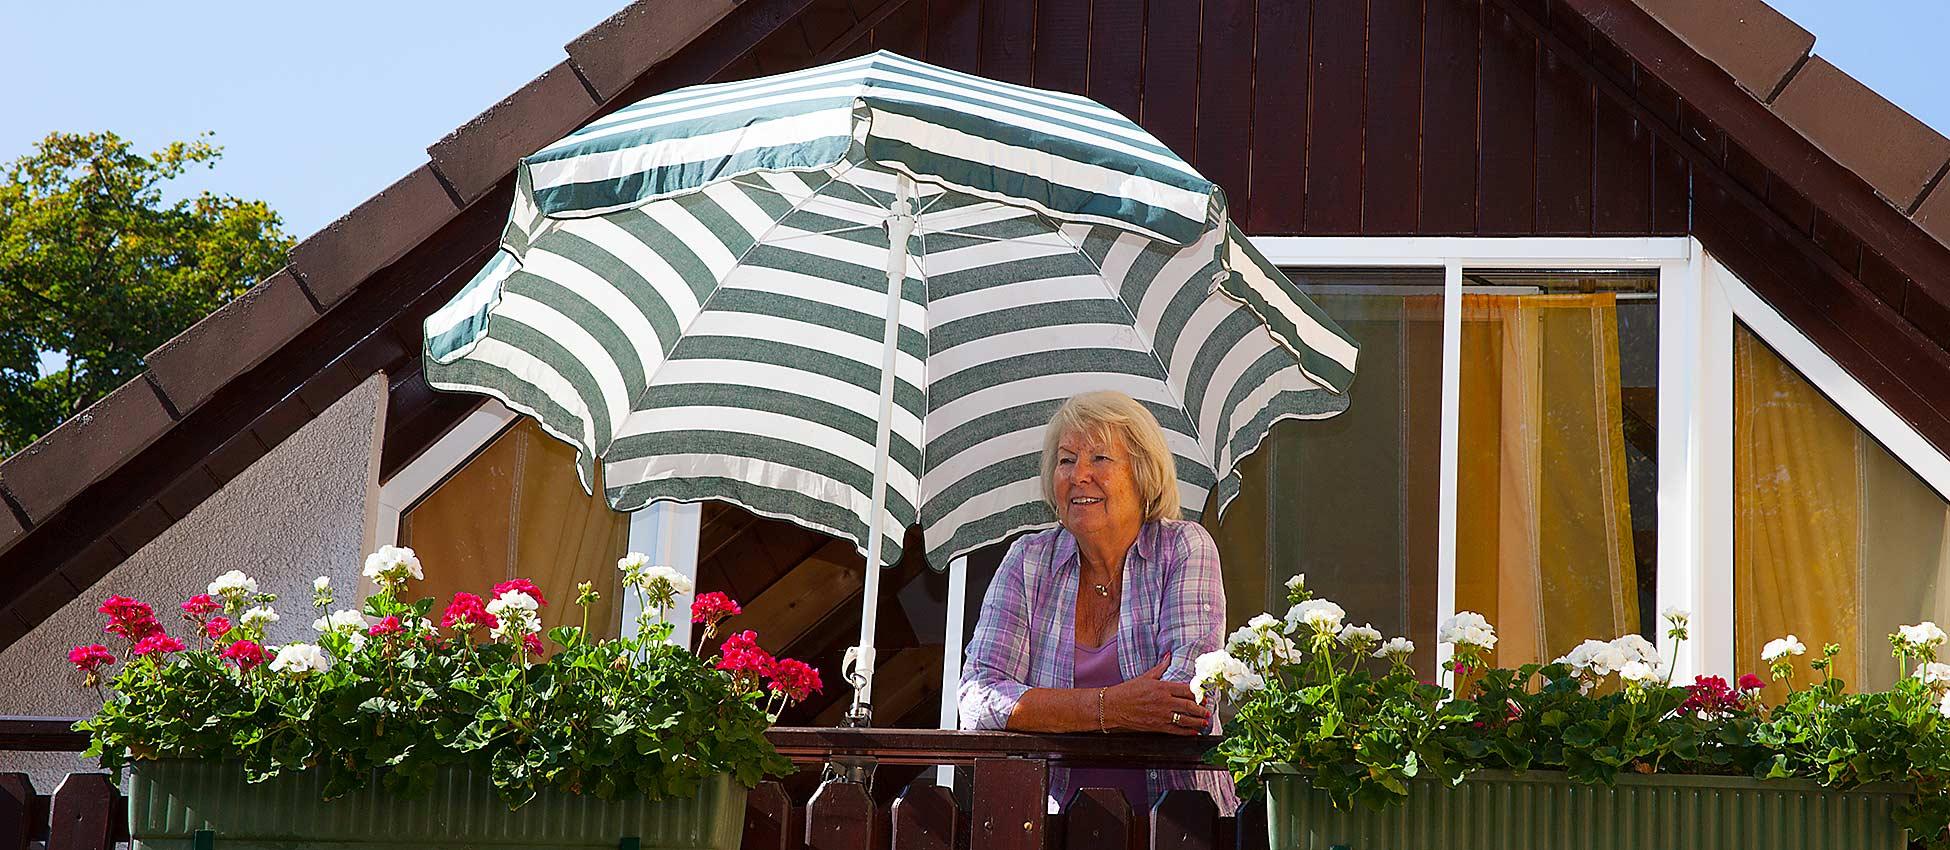 dame-auf-balkon